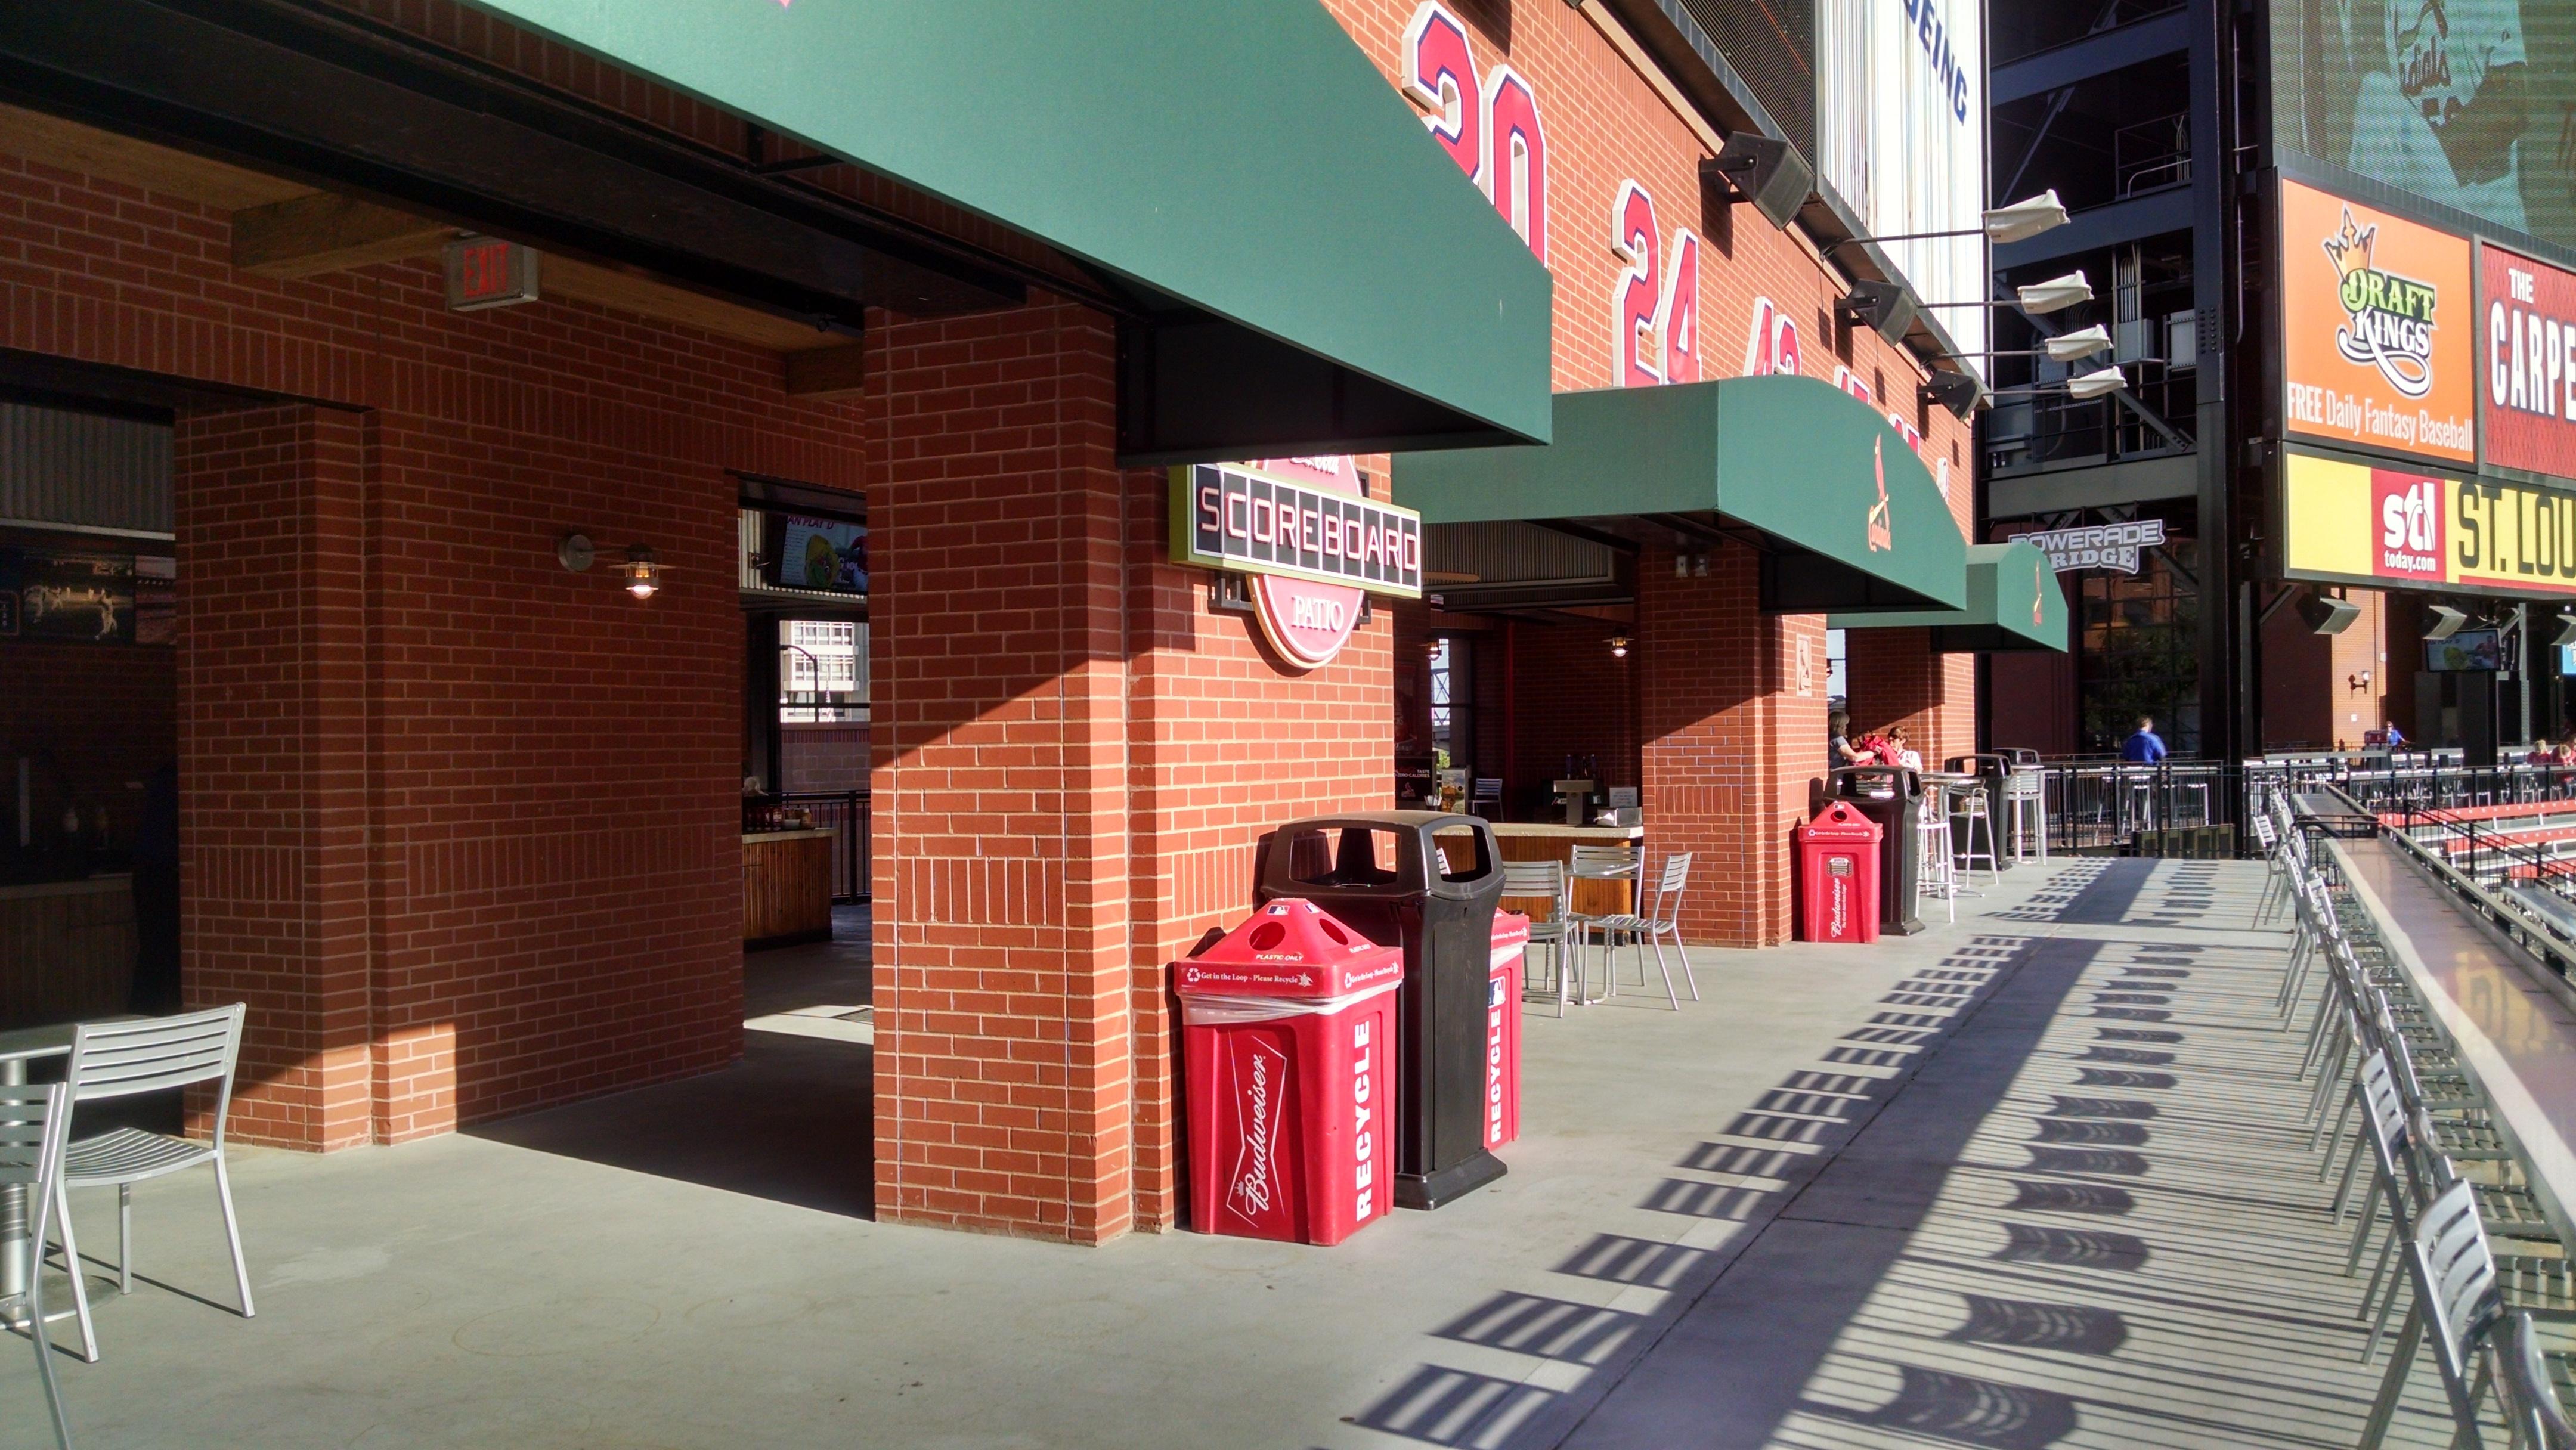 Fantastic All Inclusive Amenities Busch Stadium Coca